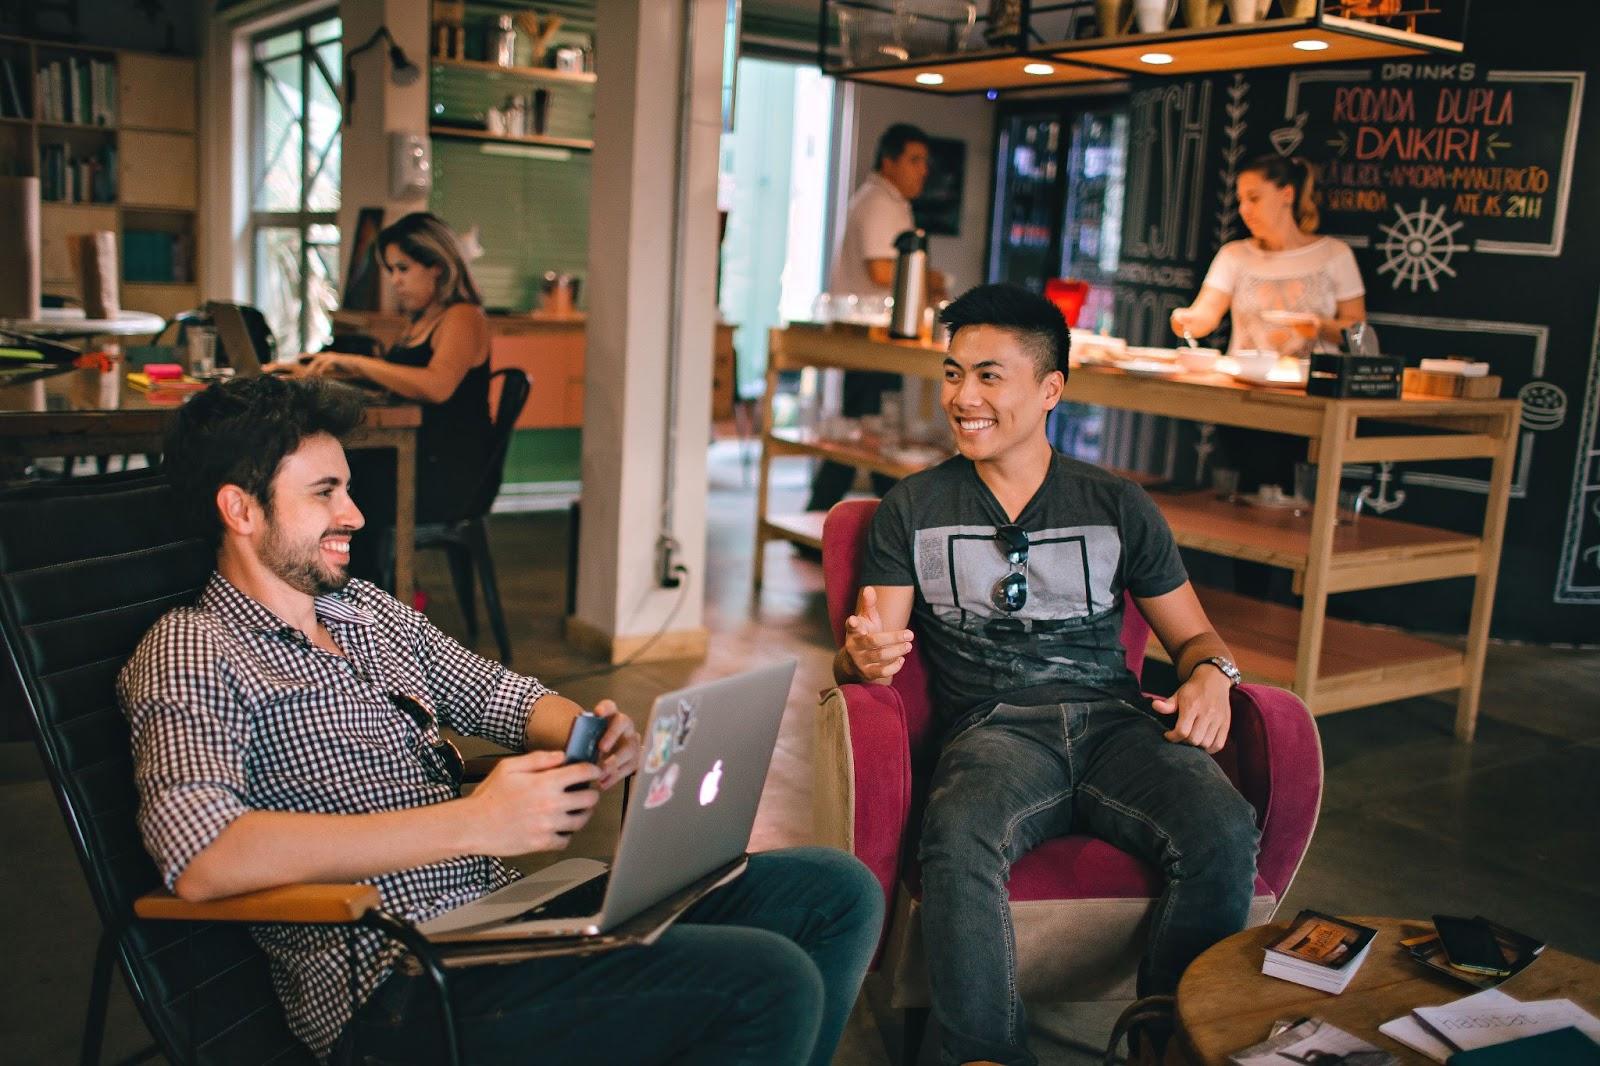 MSP incentives, staff environment, help desk, customer satisfaction